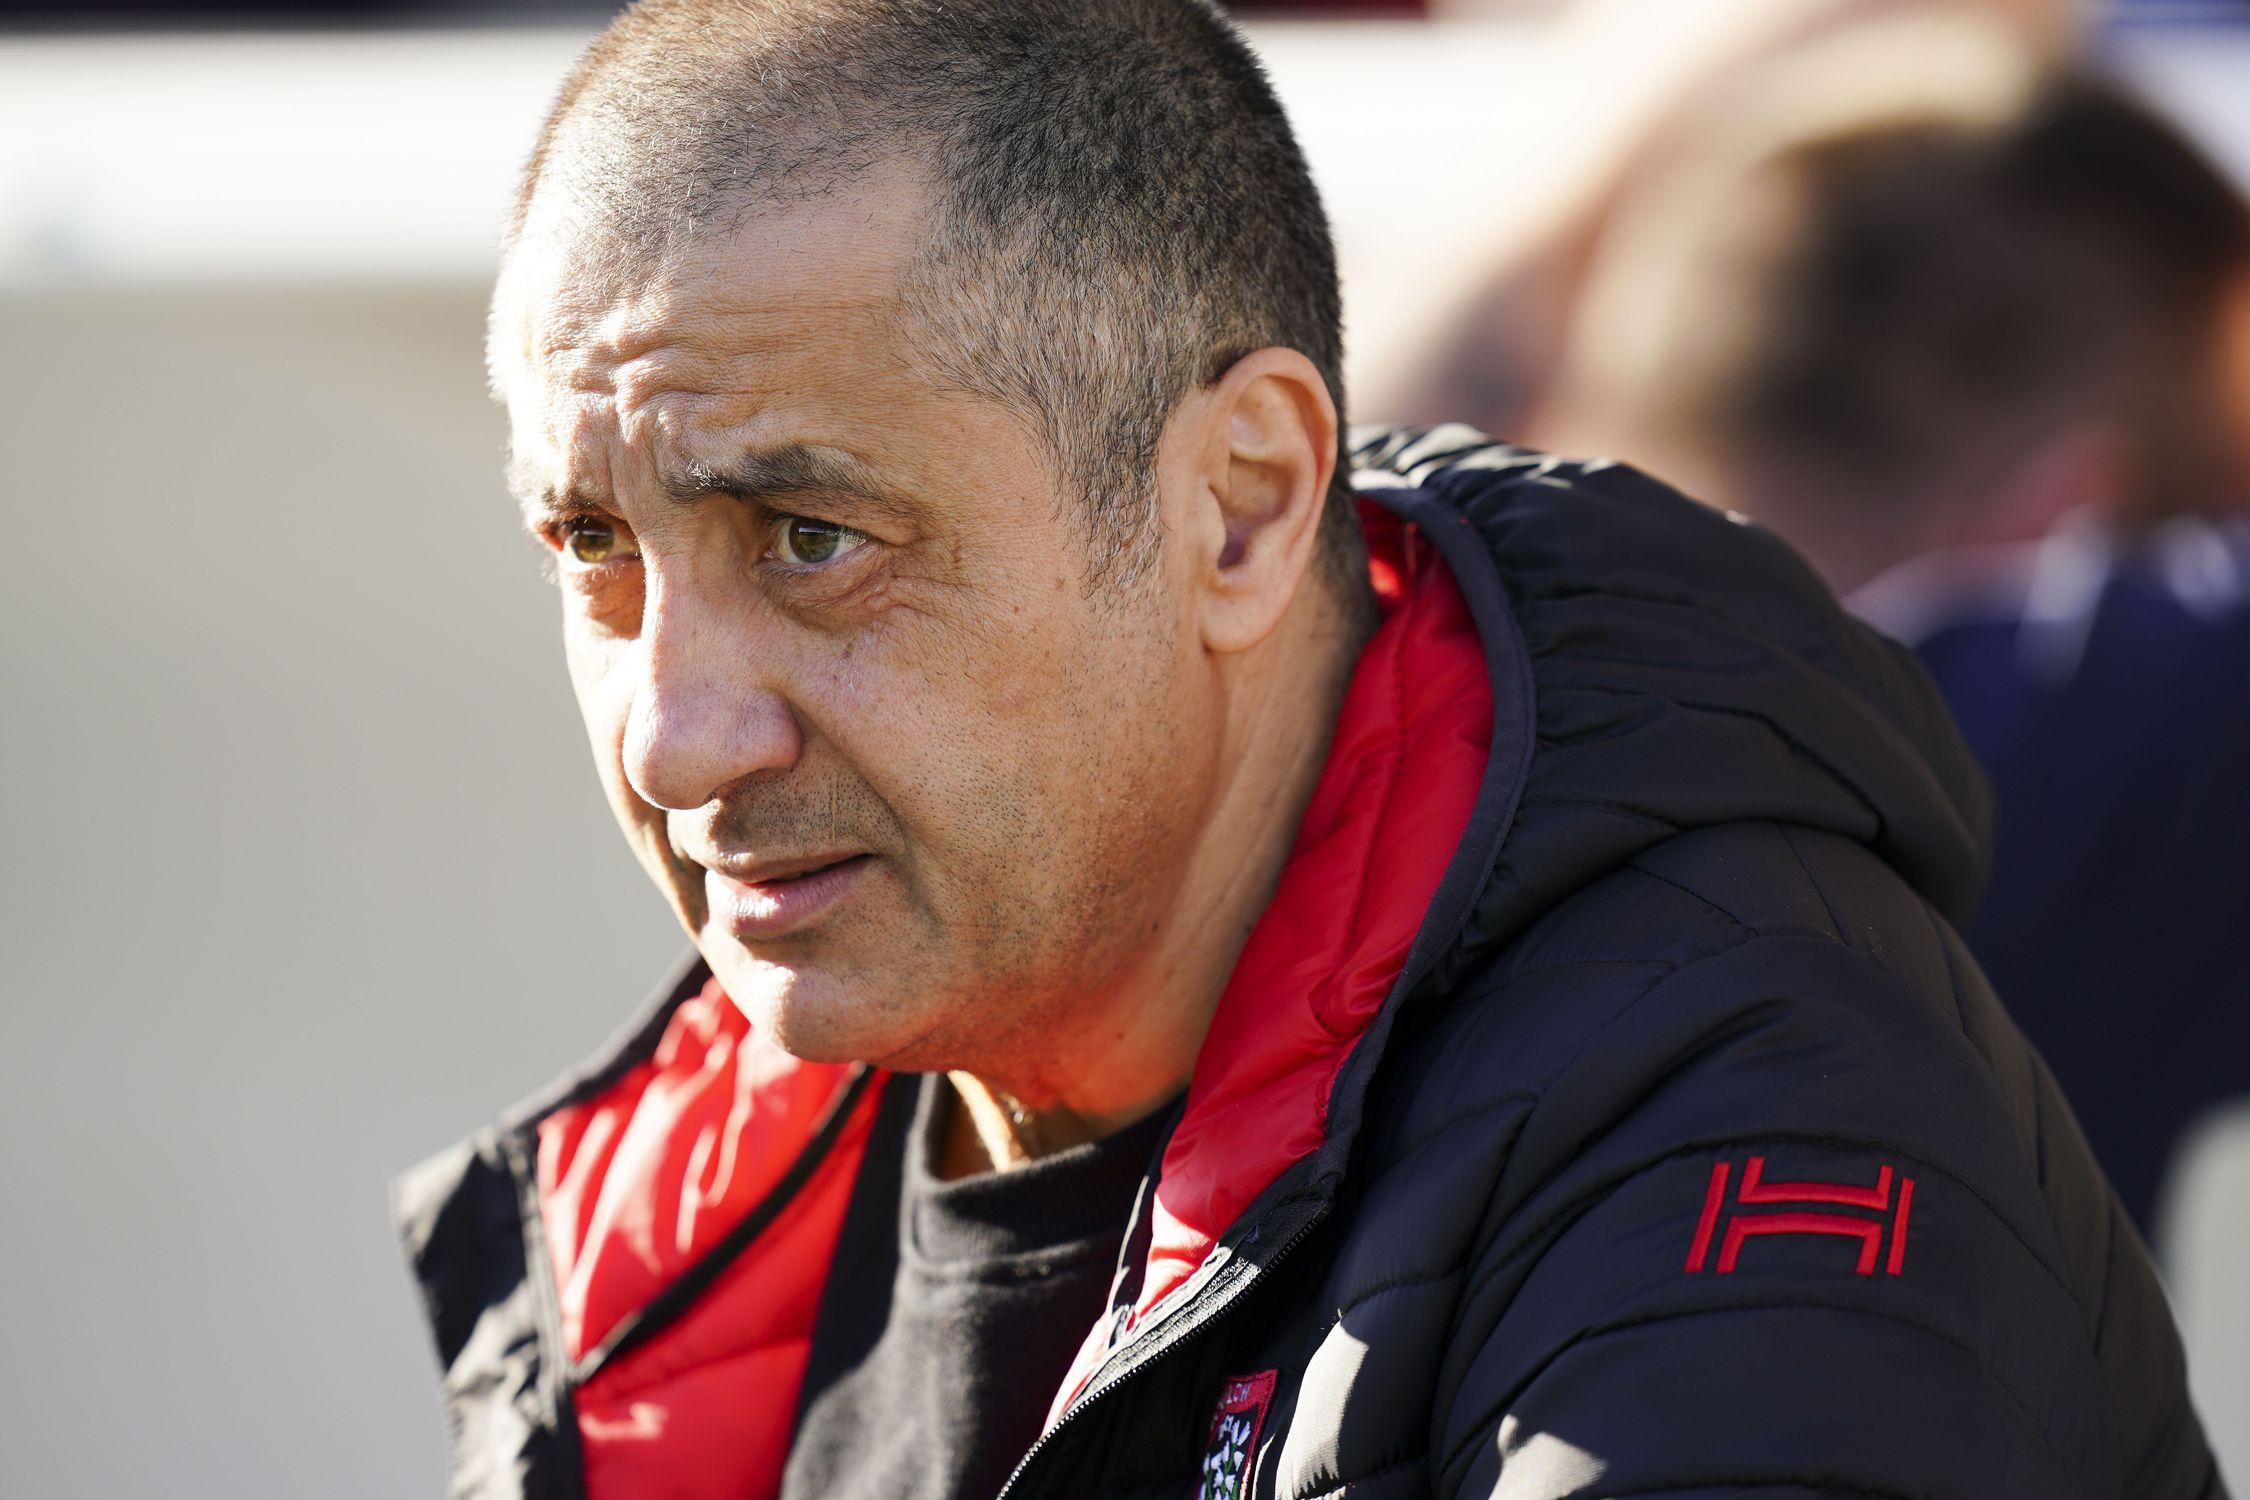 Football - Ligue 1 - Mourad Boudjellal à la tête d'un projet de rachat de l'OM